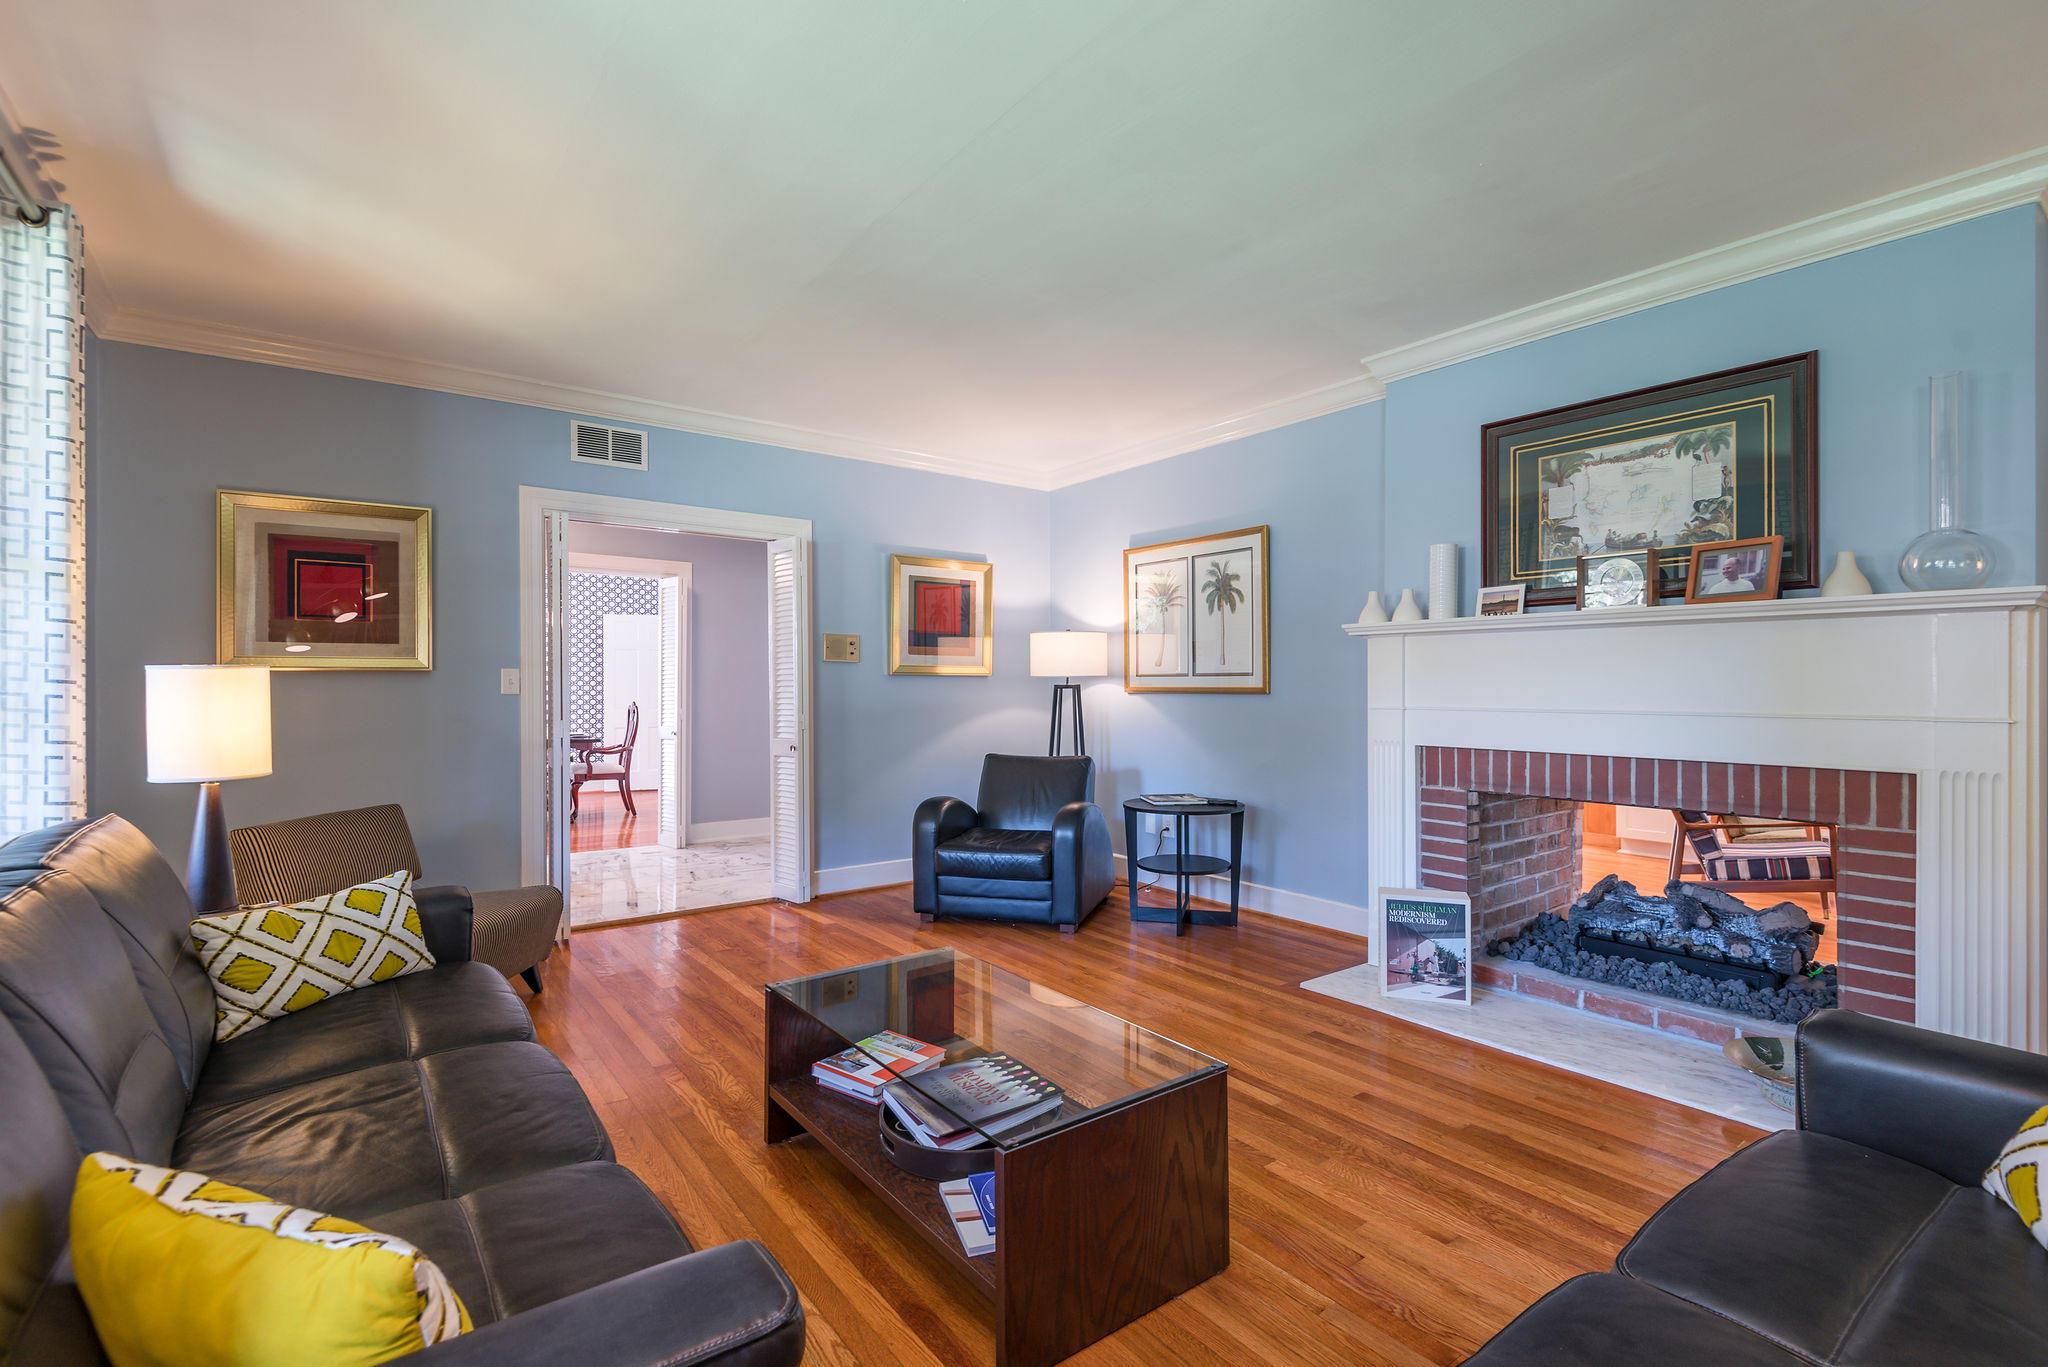 Sylvan Shores Homes For Sale - 450 Polony, Charleston, SC - 3